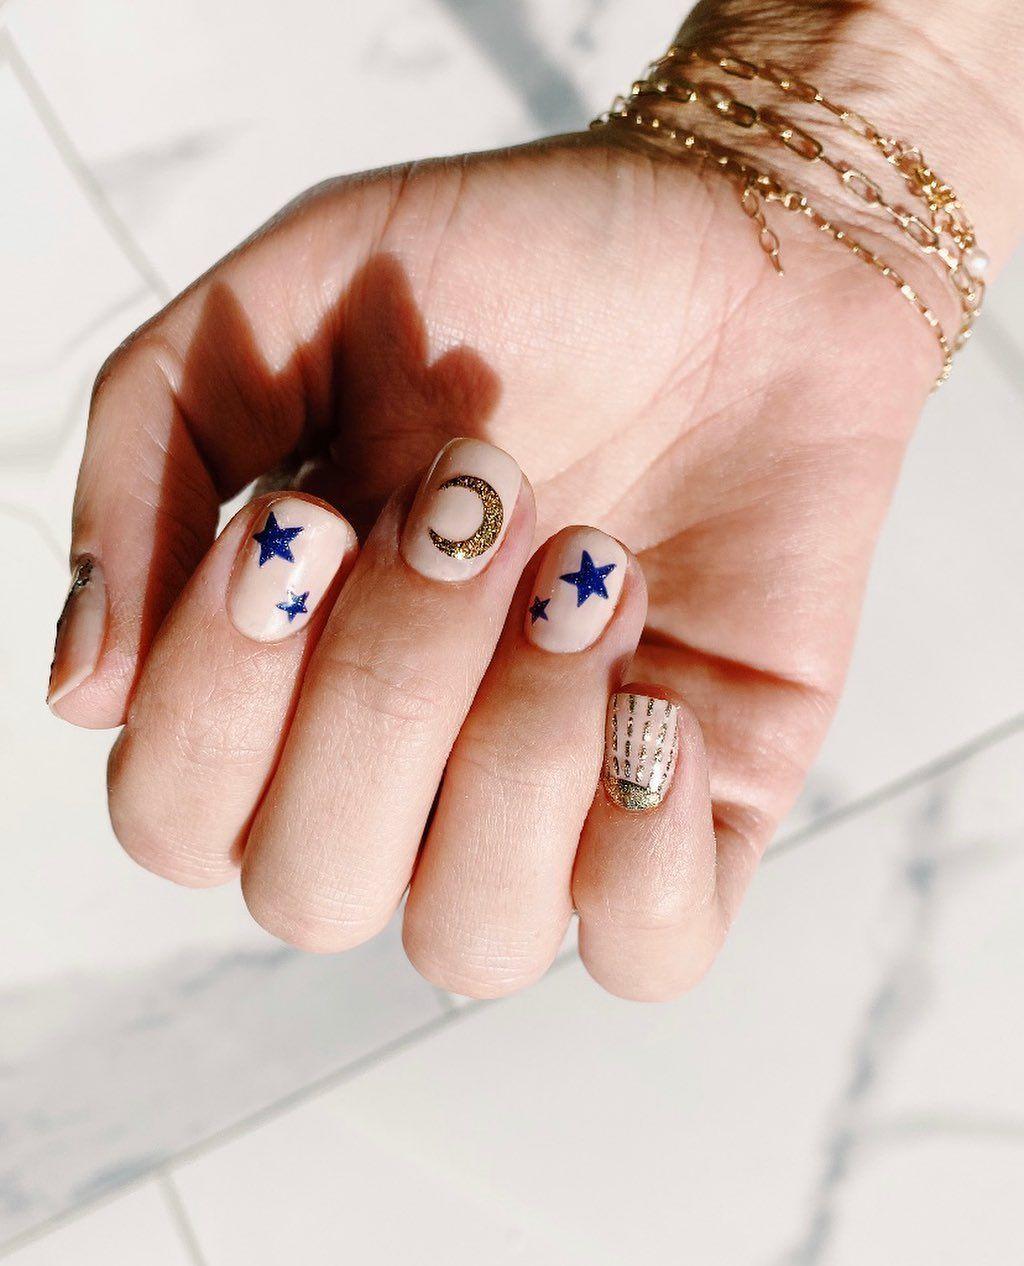 Un Joli Nailart Etoile Pour Les Fetes De Fin D Annee Star Nail Designs Star Nail Art Star Nails